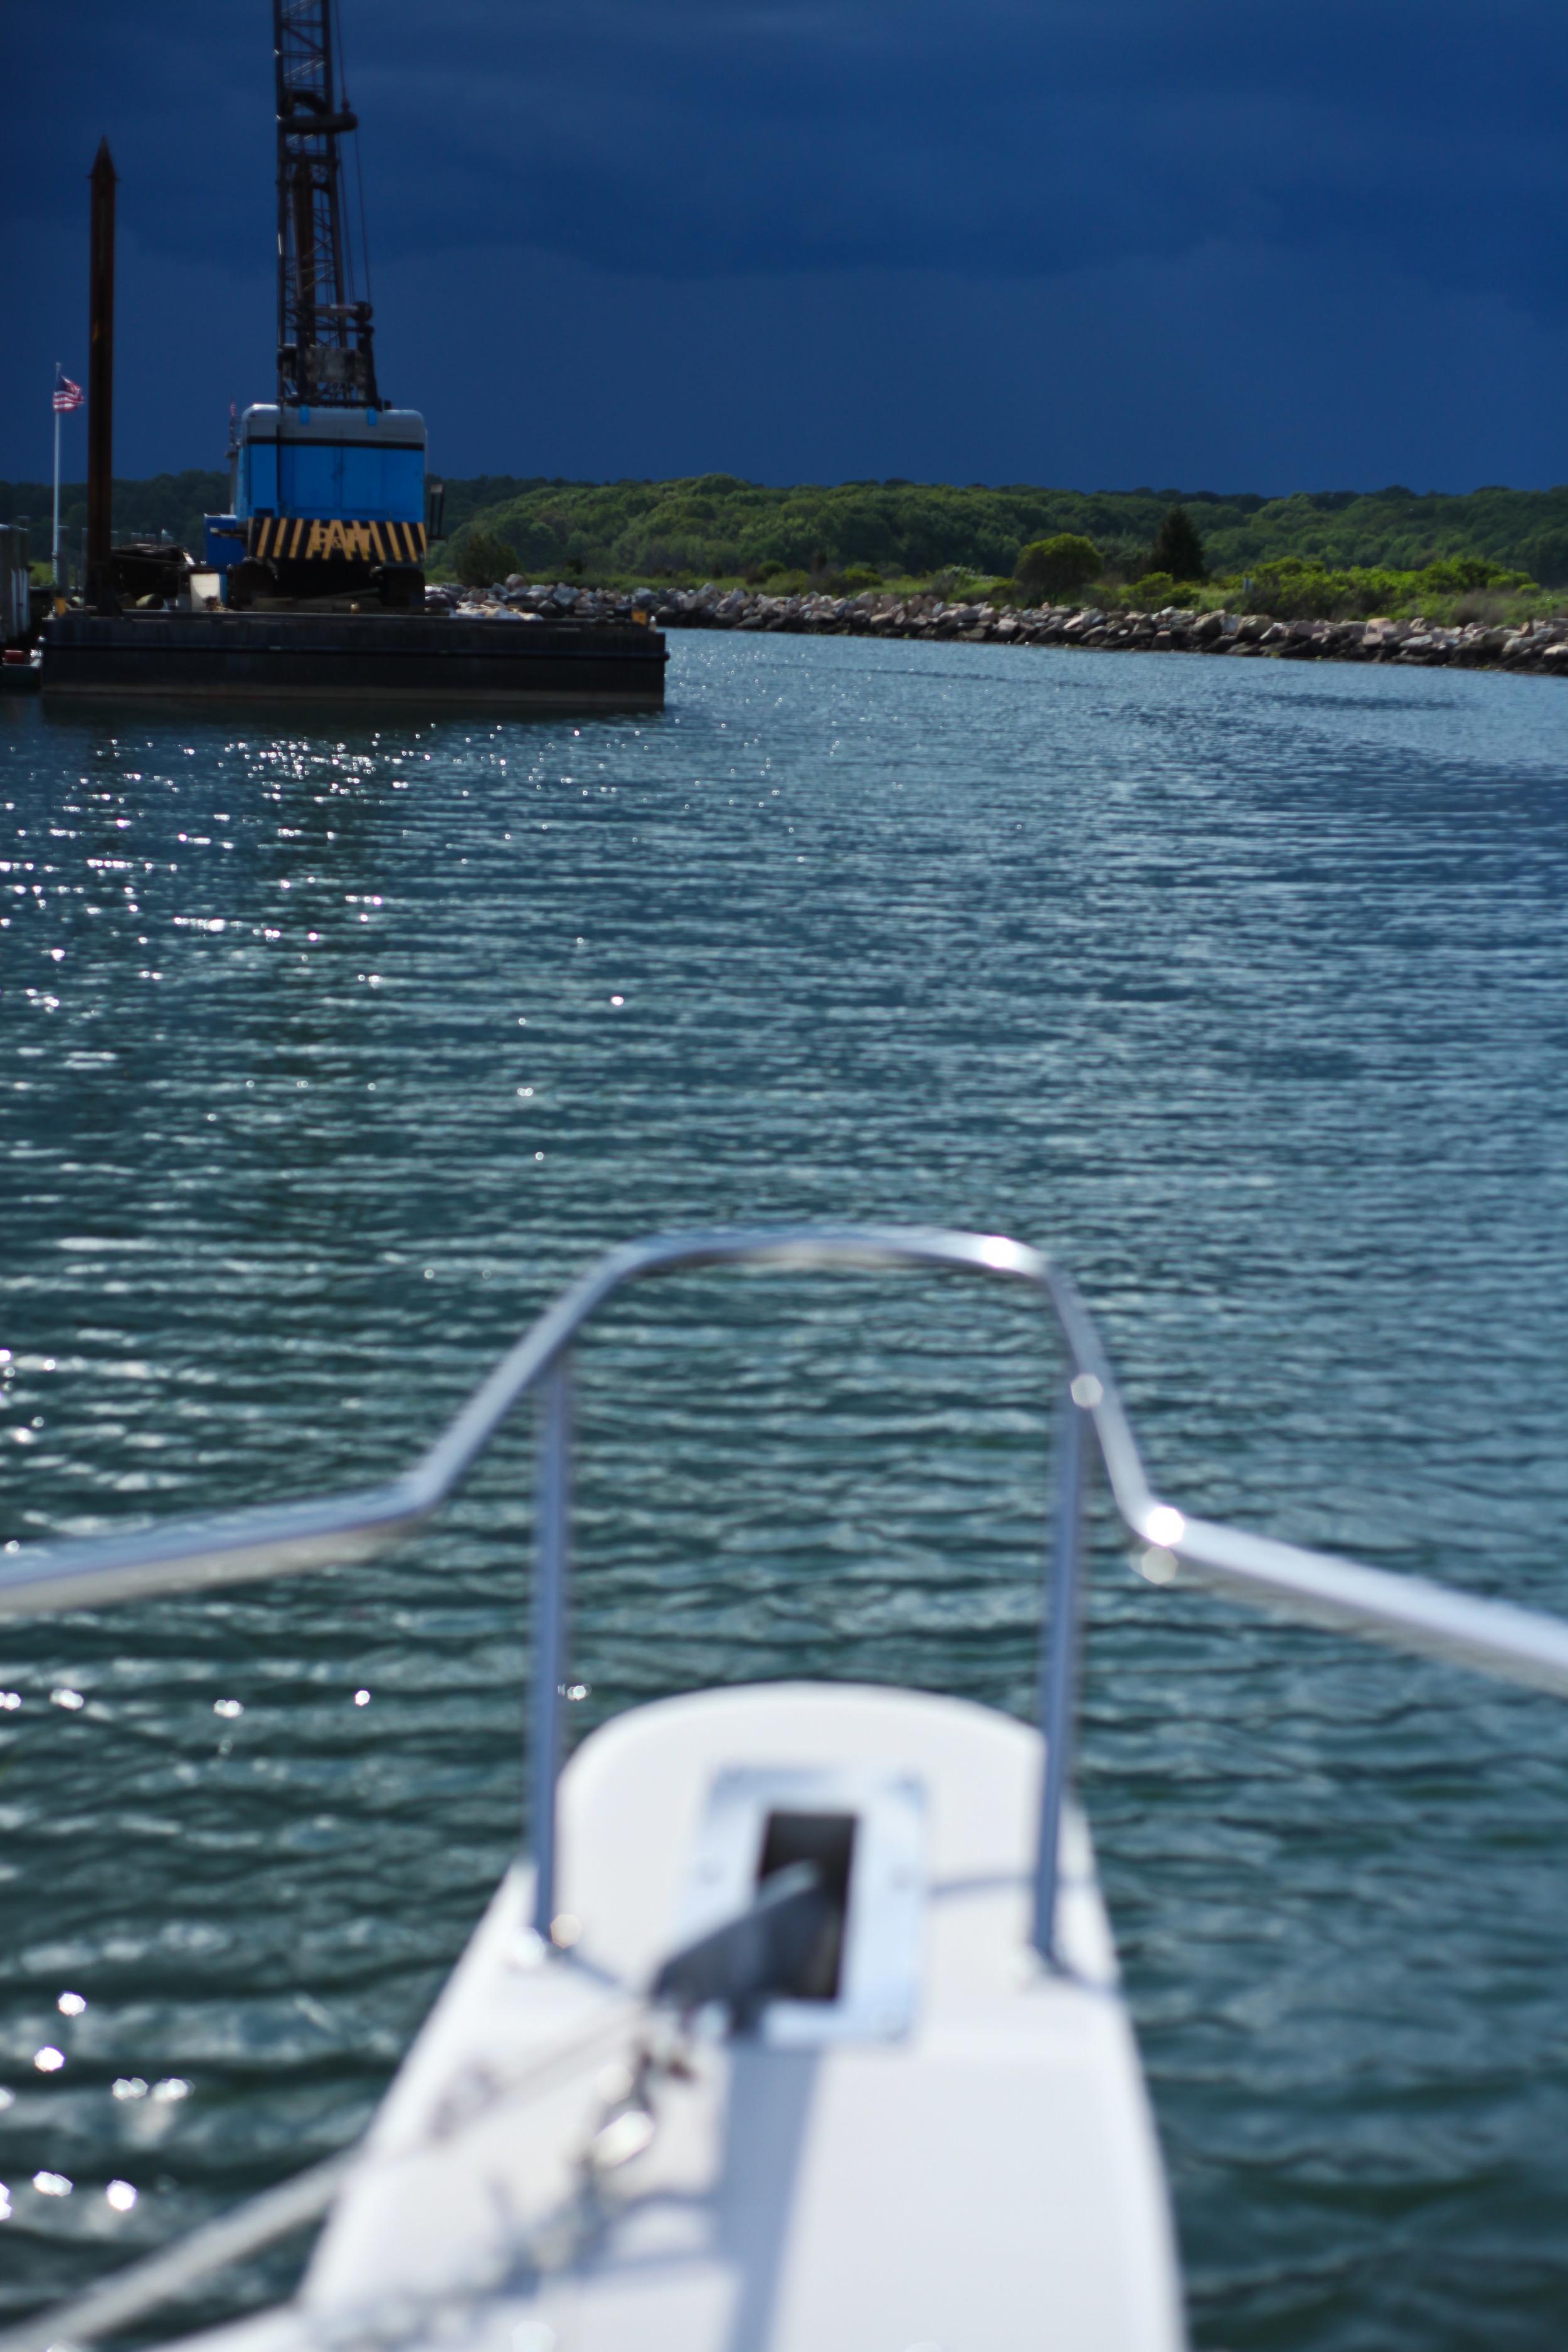 glp-lagoon-entrance-alue-optics